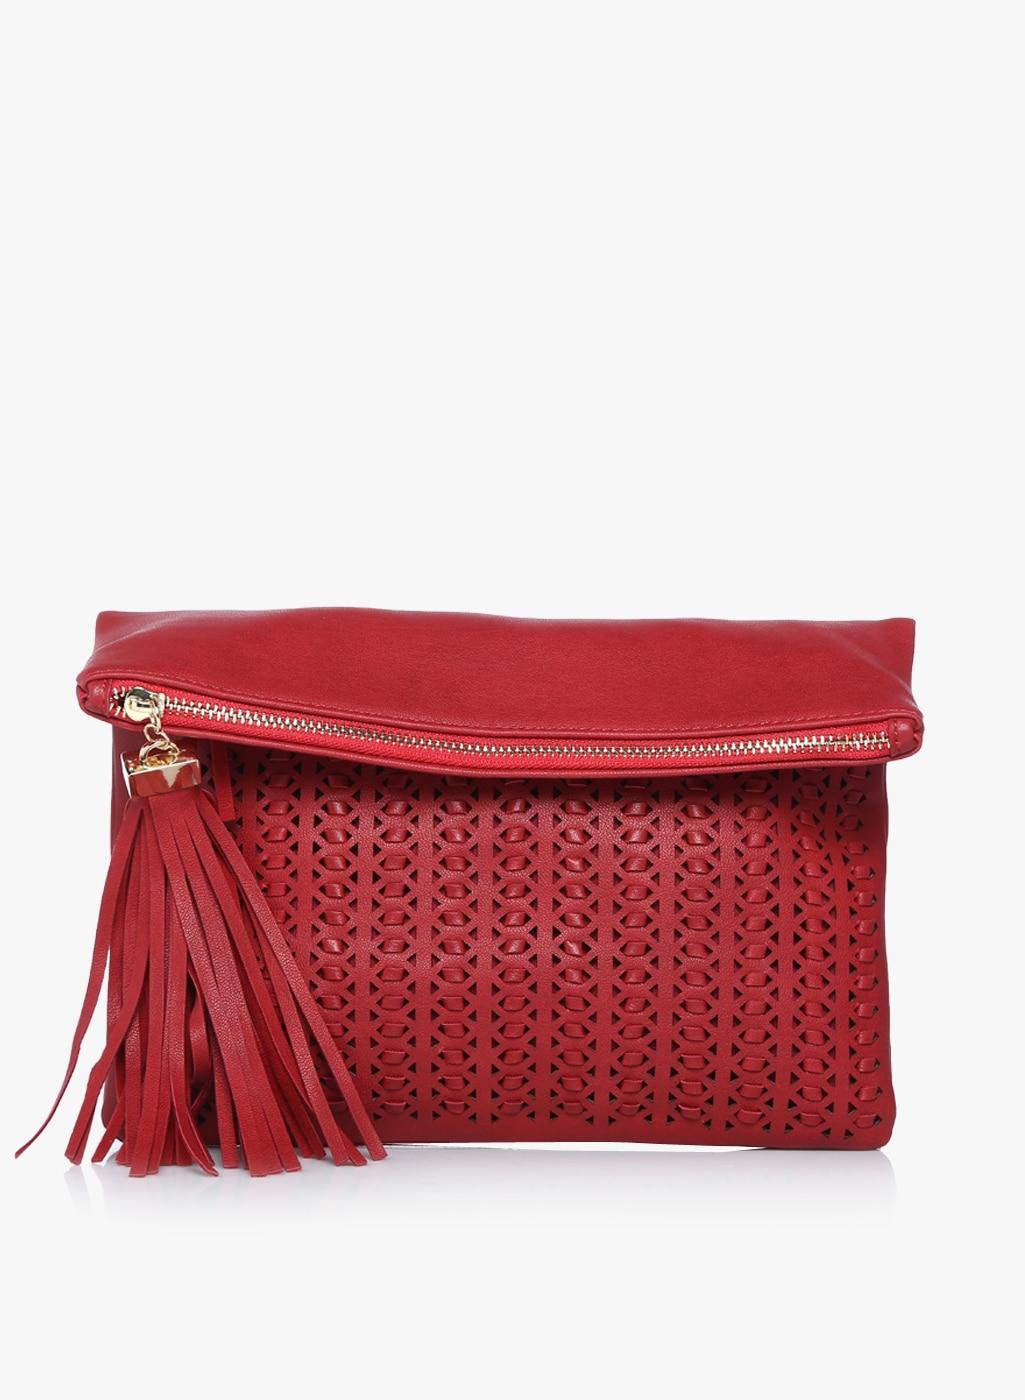 20ef1cc03818 Accessories - Buy Fashion Accessories for Women & Men Online